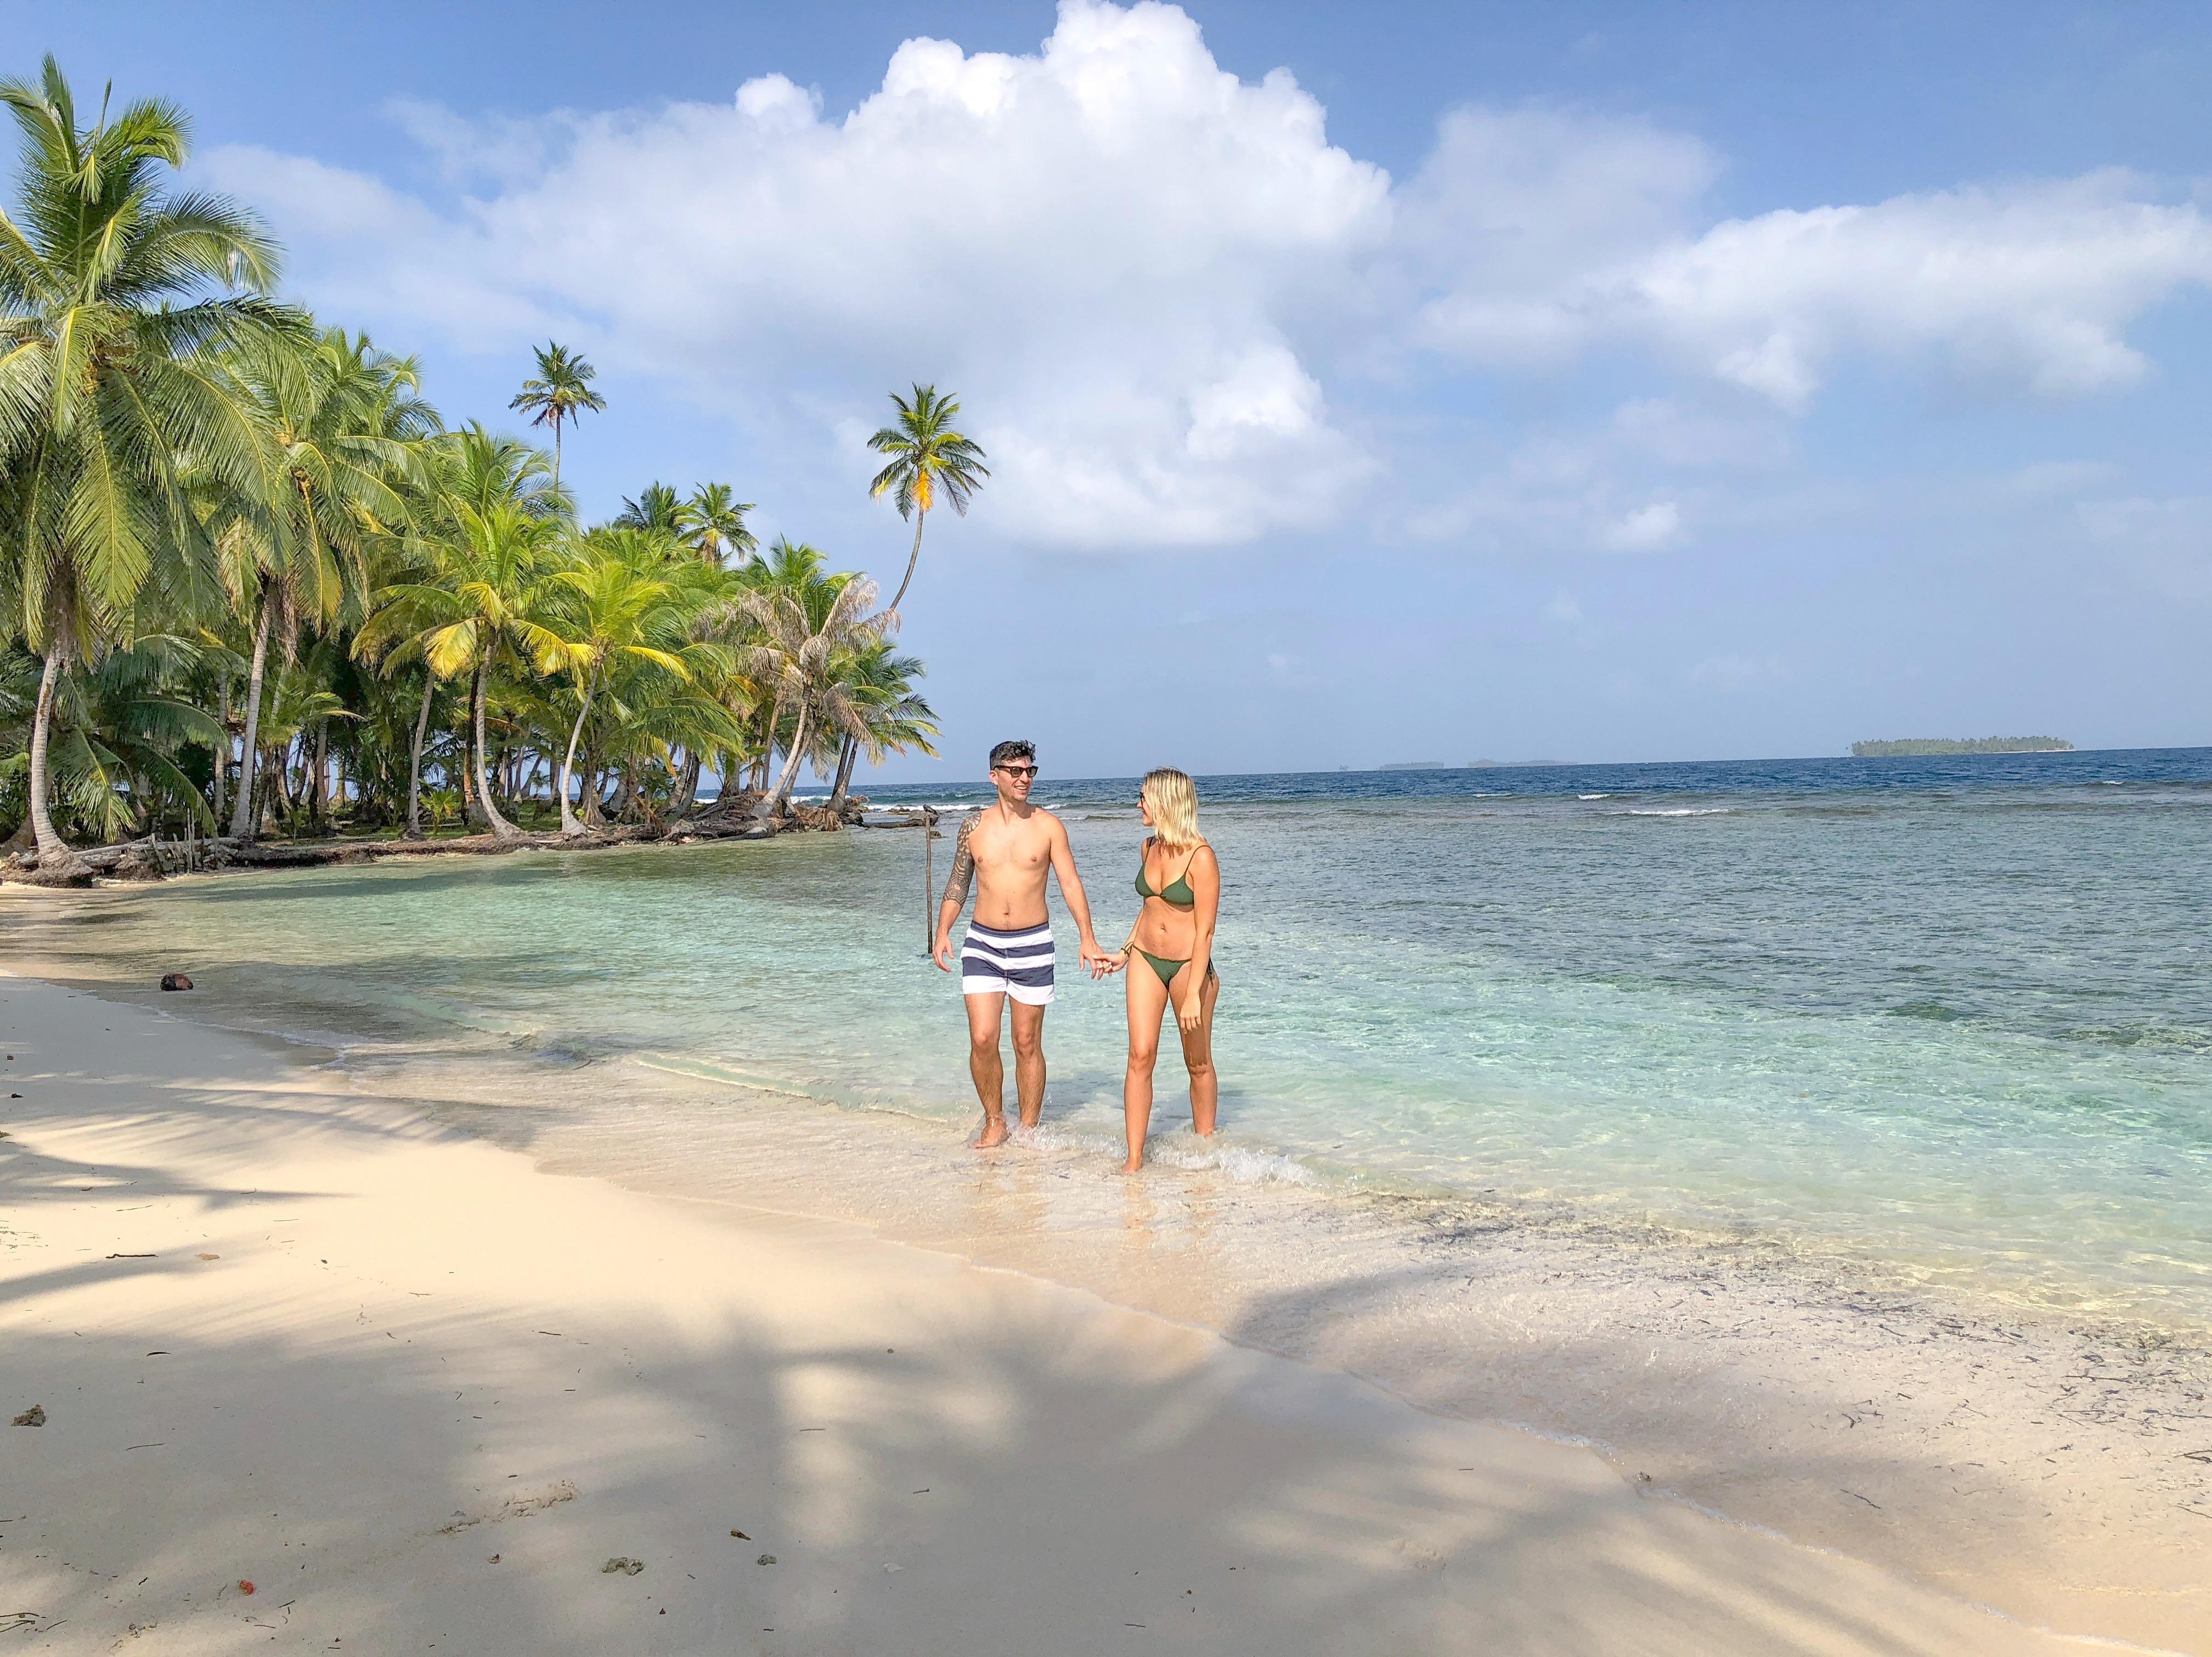 narasgandup , melhores praias san Blas